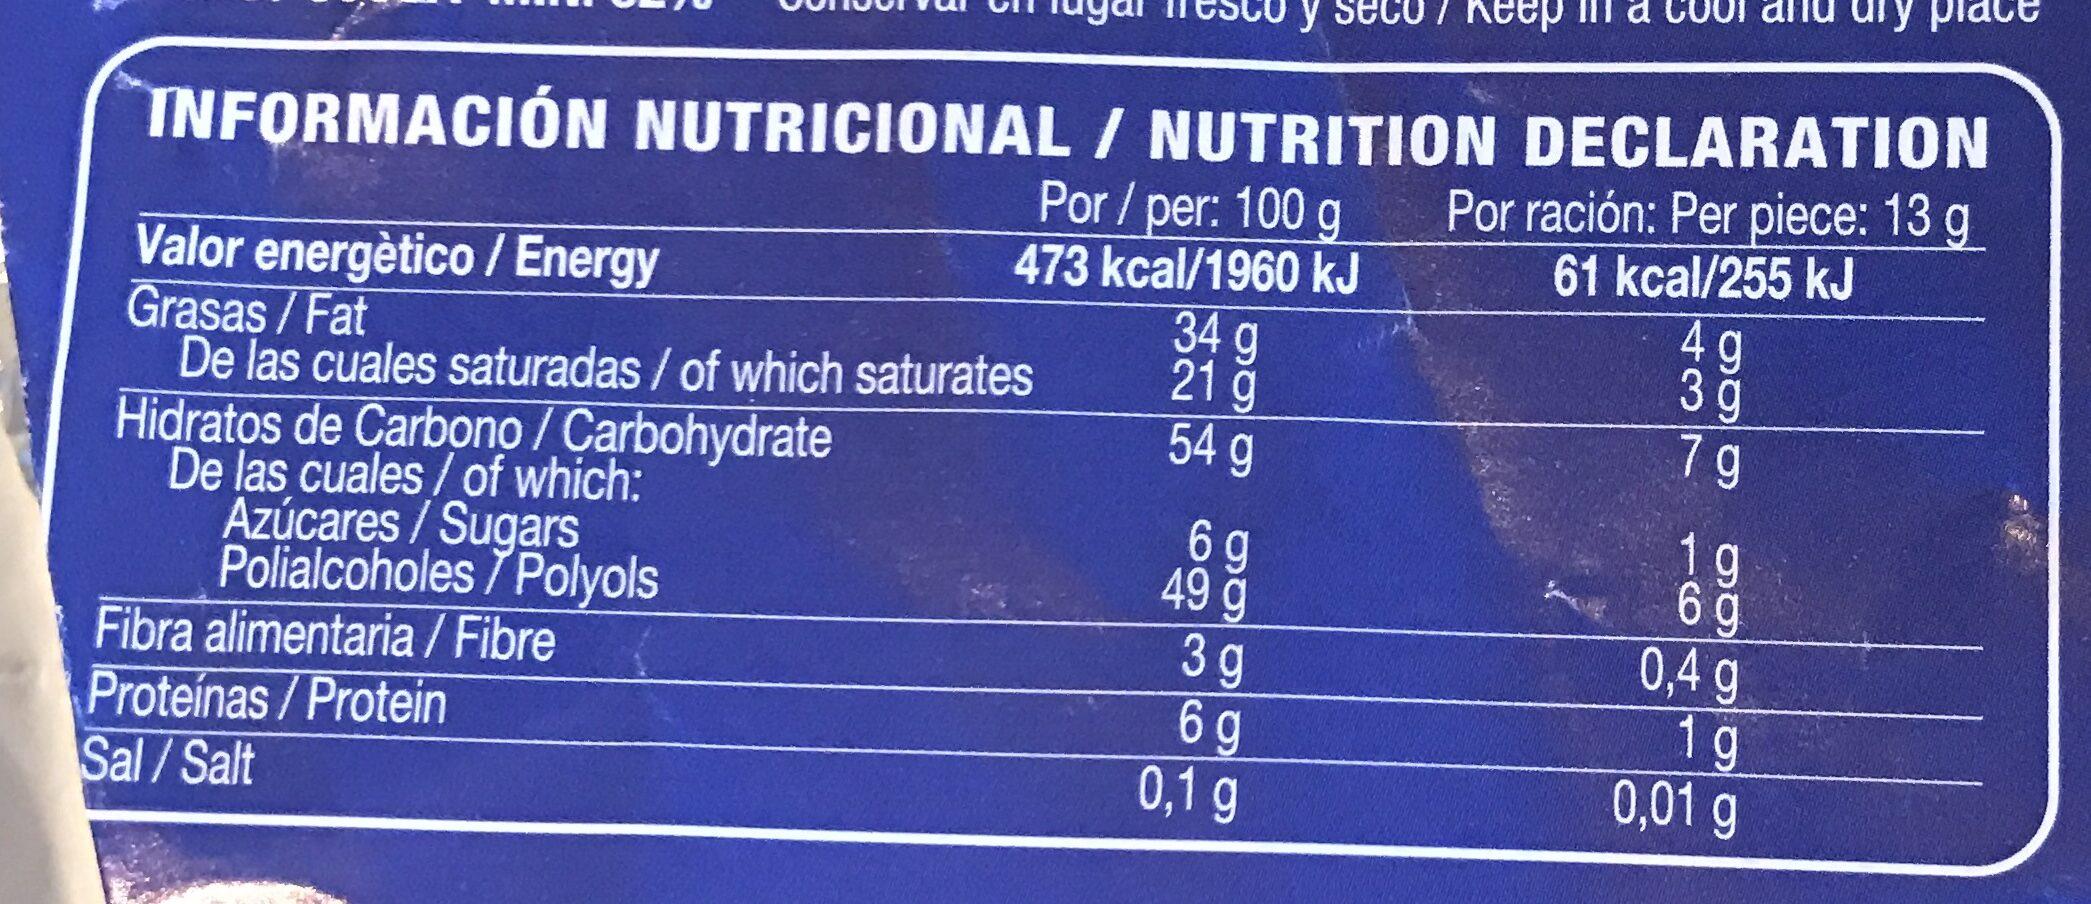 Chocolate con leche - Informació nutricional